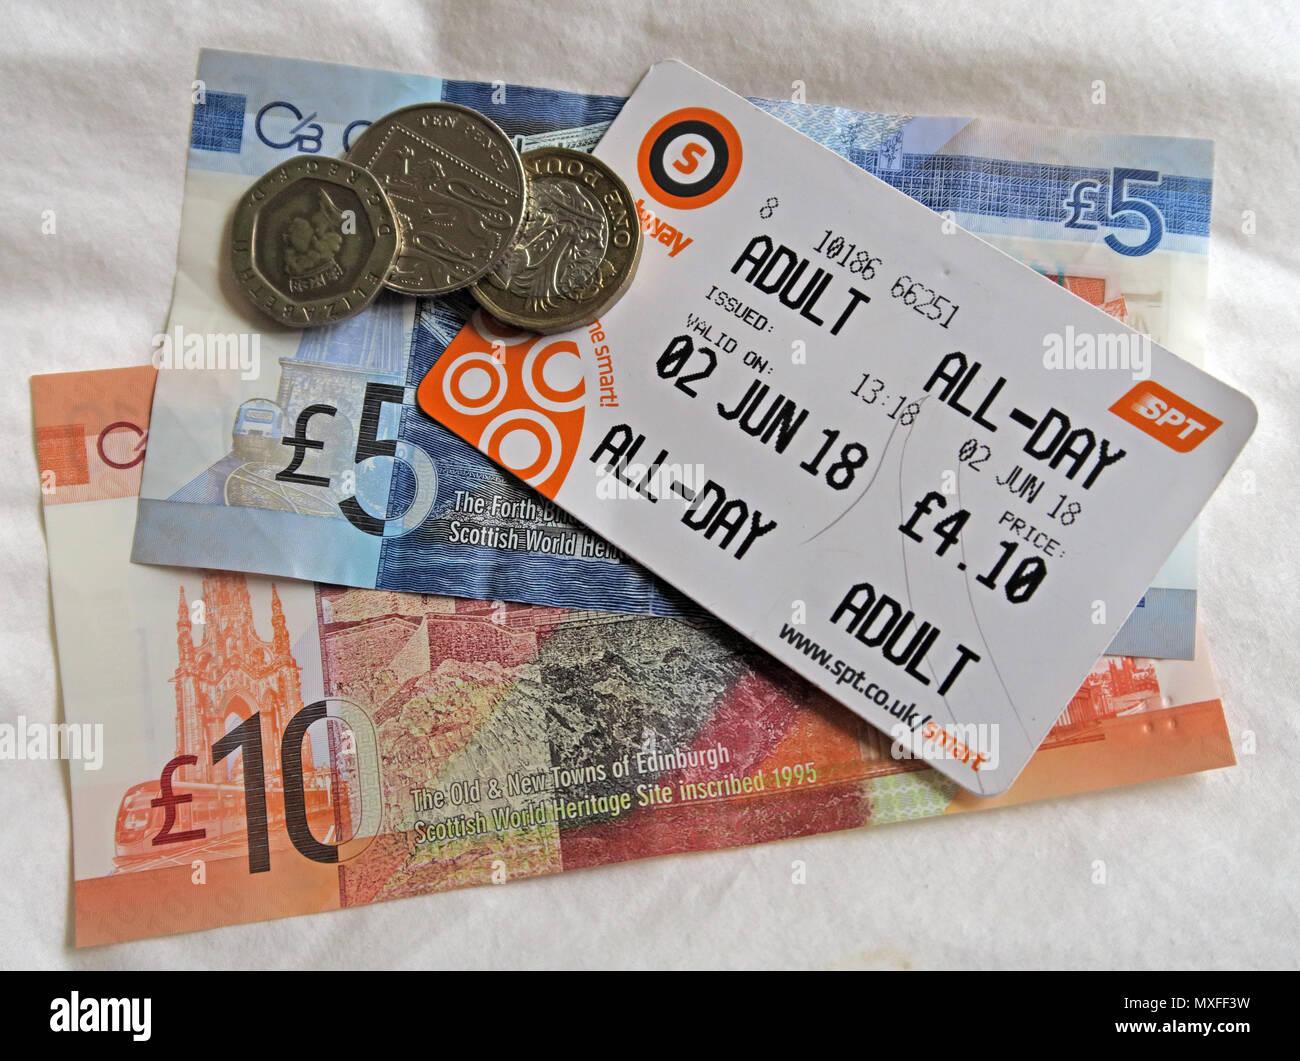 GoTonySmith,@HotpixUK,Adult,All-day,travel,card,Metro,Tub,integrated transport,system,Scottish,Money,notes,Scottish Notes,Clyde,underground railway,Strathclyde Partnership for Transport,Strathclyde,SPT,suburban railway network,suburban railway,ticket,smartcard,travel ticket,smart card,fare,fares,ticketing,tickets,Glasgow subway ticket,Crossrail Glasgow,five pound,ten pound,change,coin,coins,integrated smartcard ticketing,smartcard ticketing